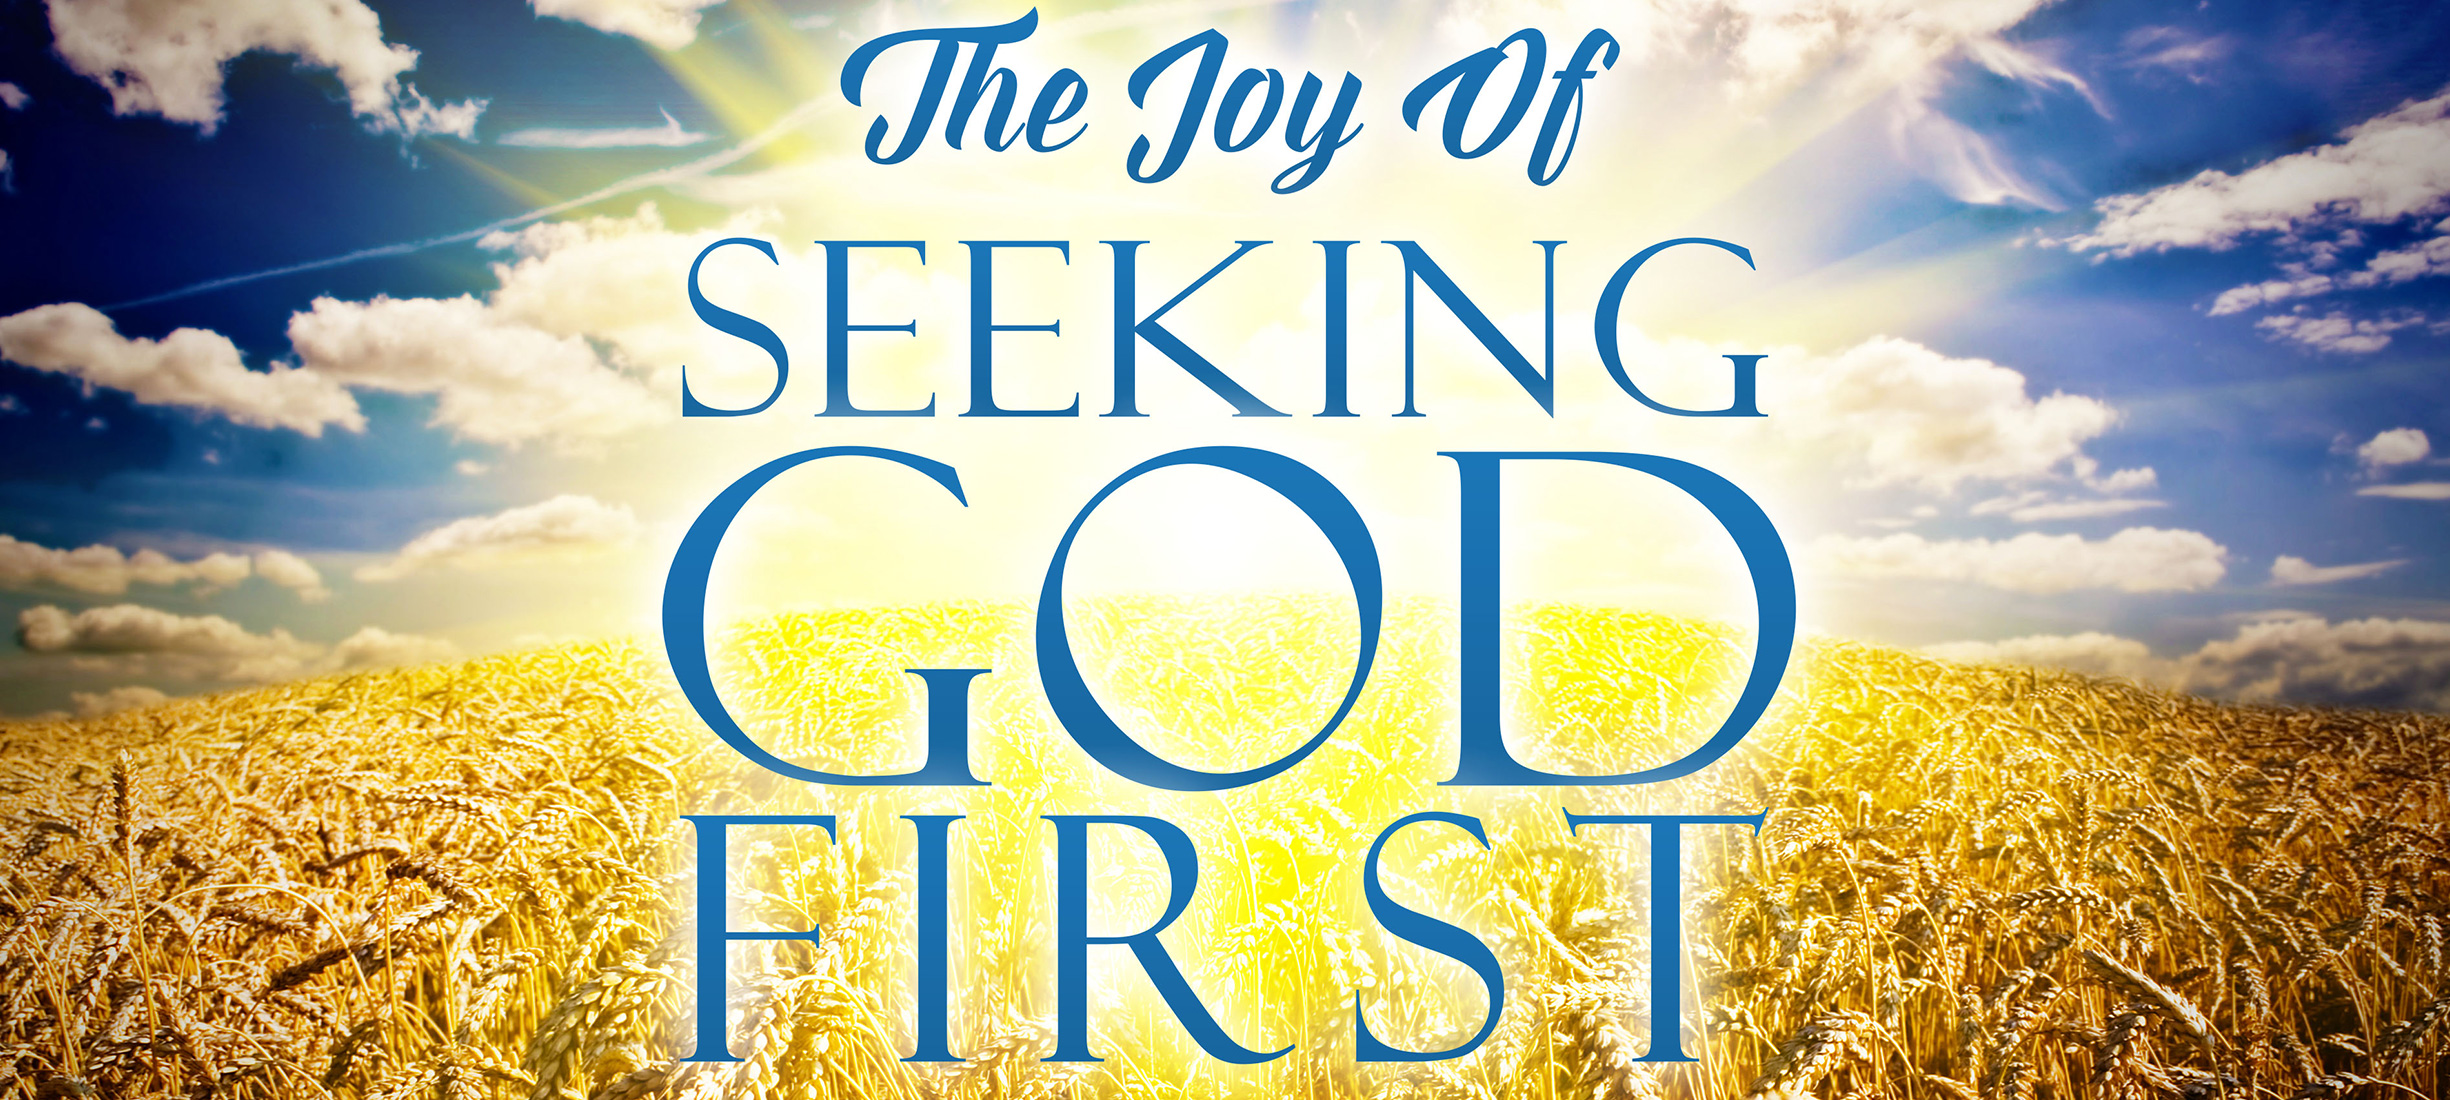 MOVIE_Joy Of Seeking God First_2011_PA.jpg